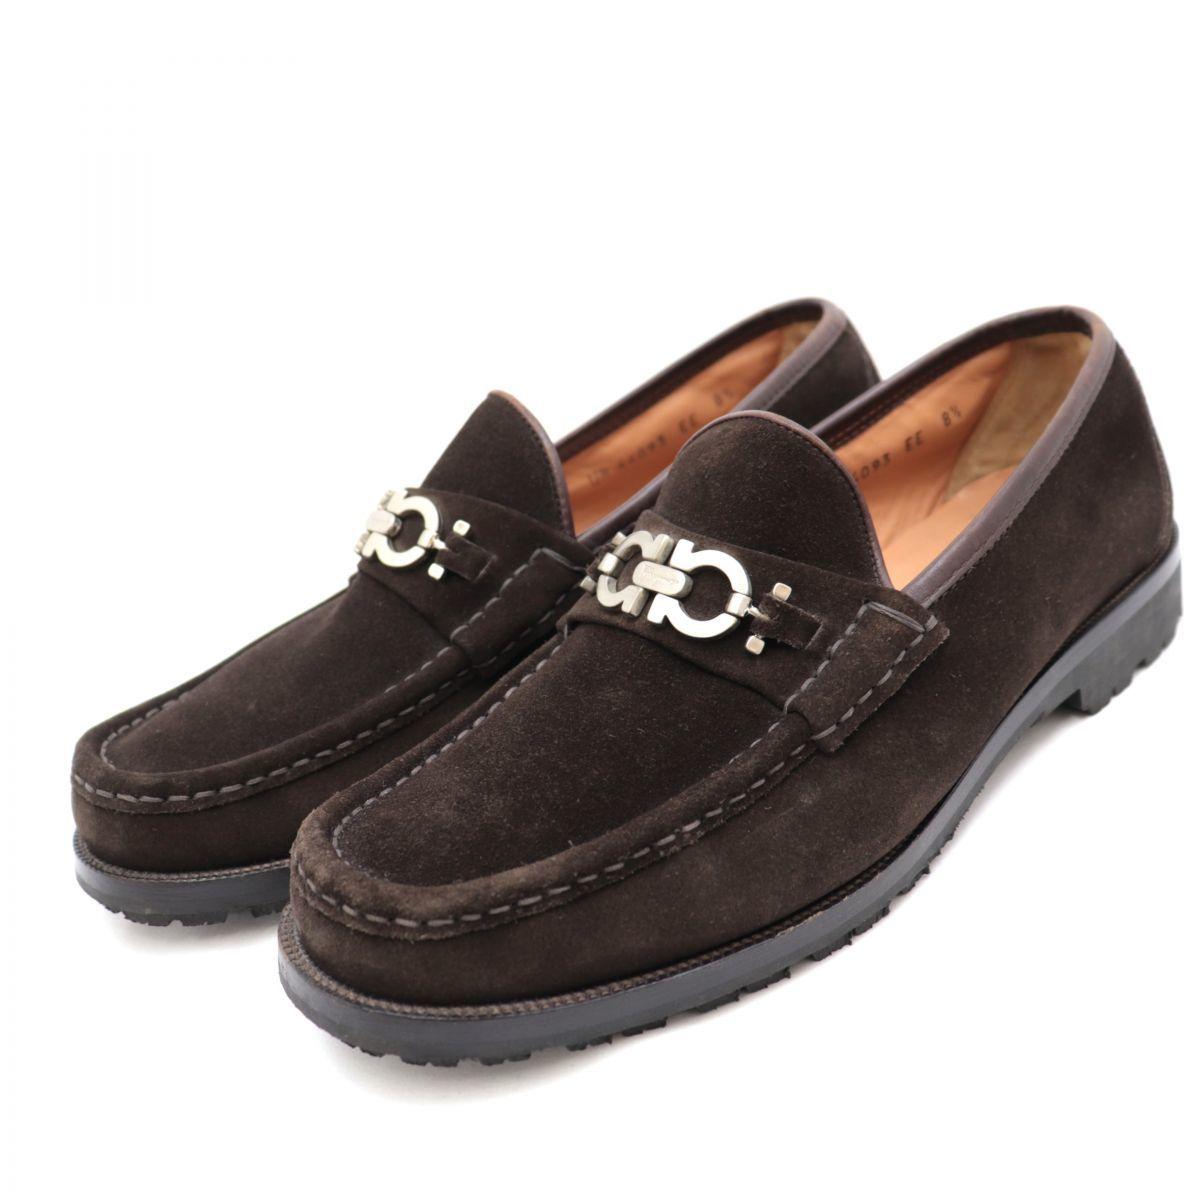 Salvatore Ferragamo DIEGO Gancio Suede Bit Loafers Men's Brown 8.5EE Shoes